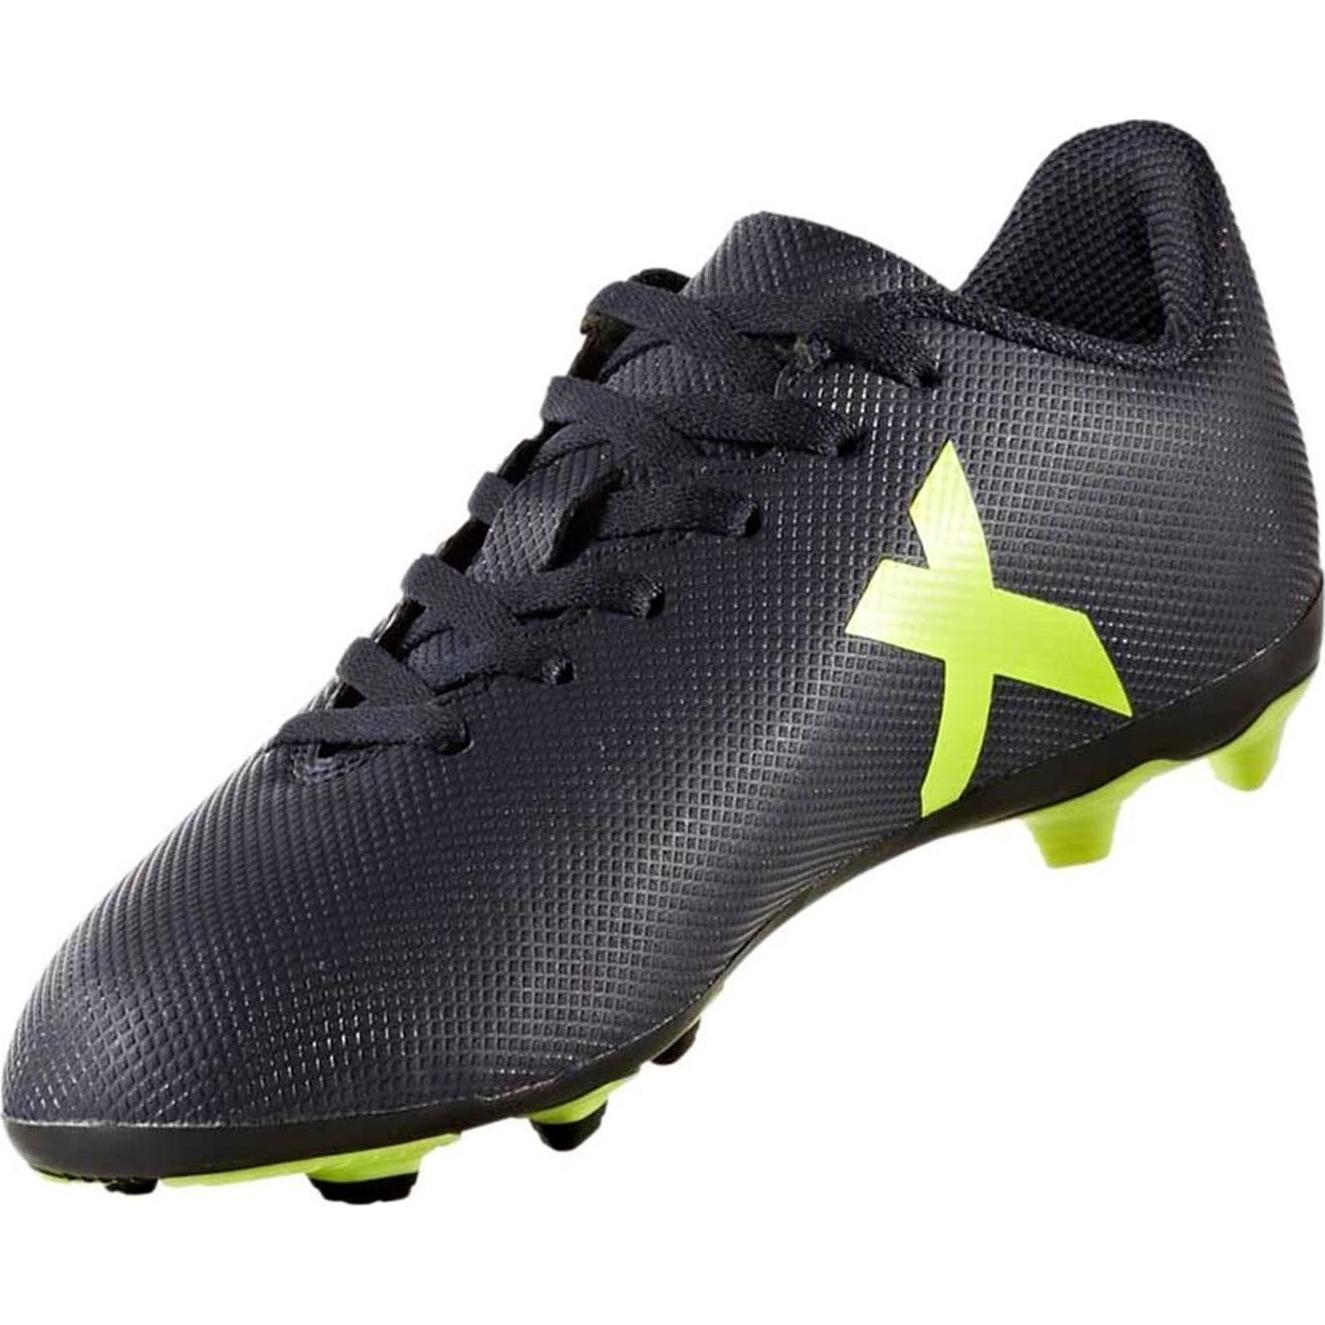 adidas scarpe calcio 17.4